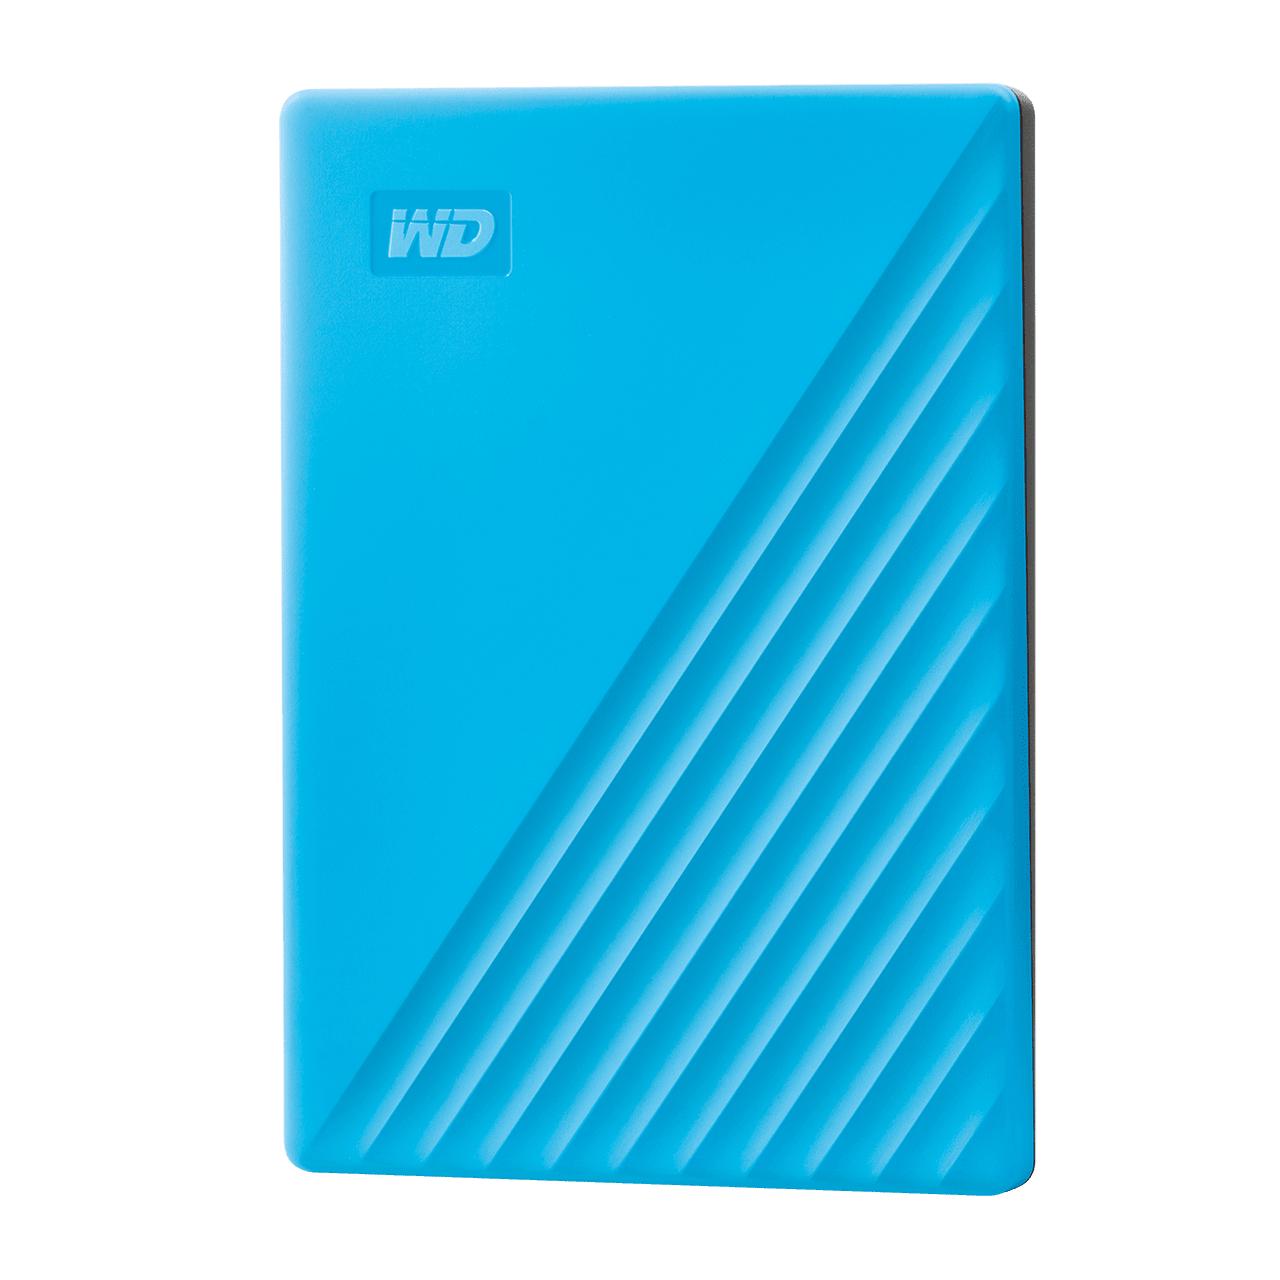 Disco Duro WD My Passport para Mac 2TB por 17€